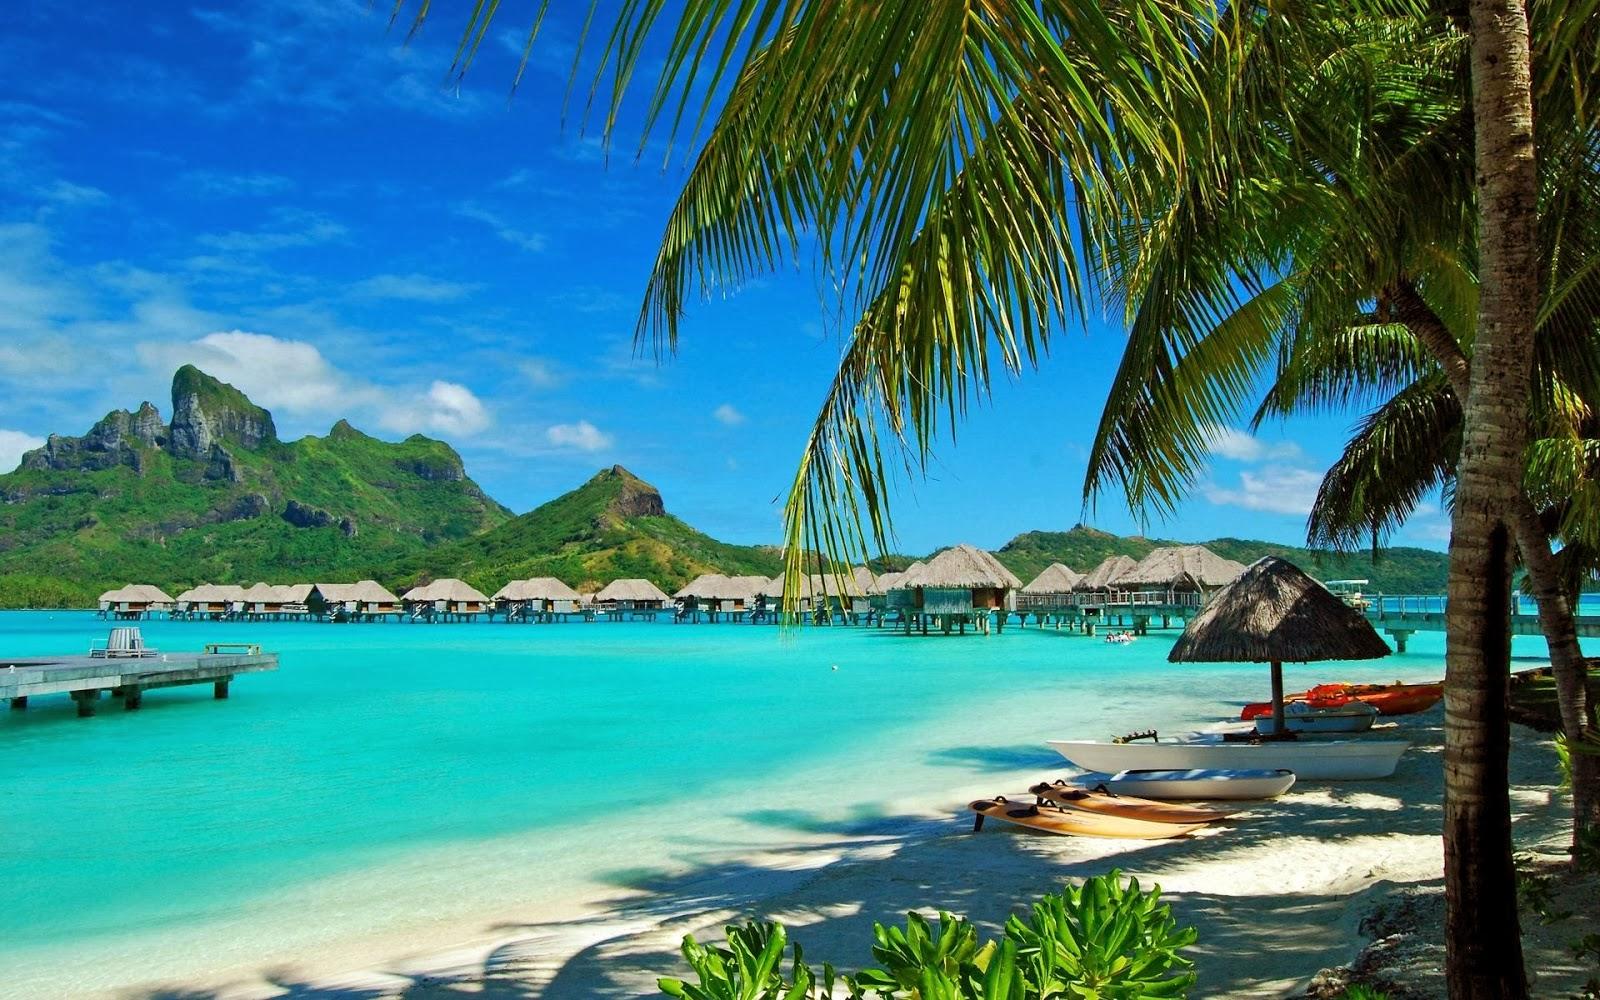 Hawaii Island Full HD Desktop Wallpapers 1080p 1600x1000